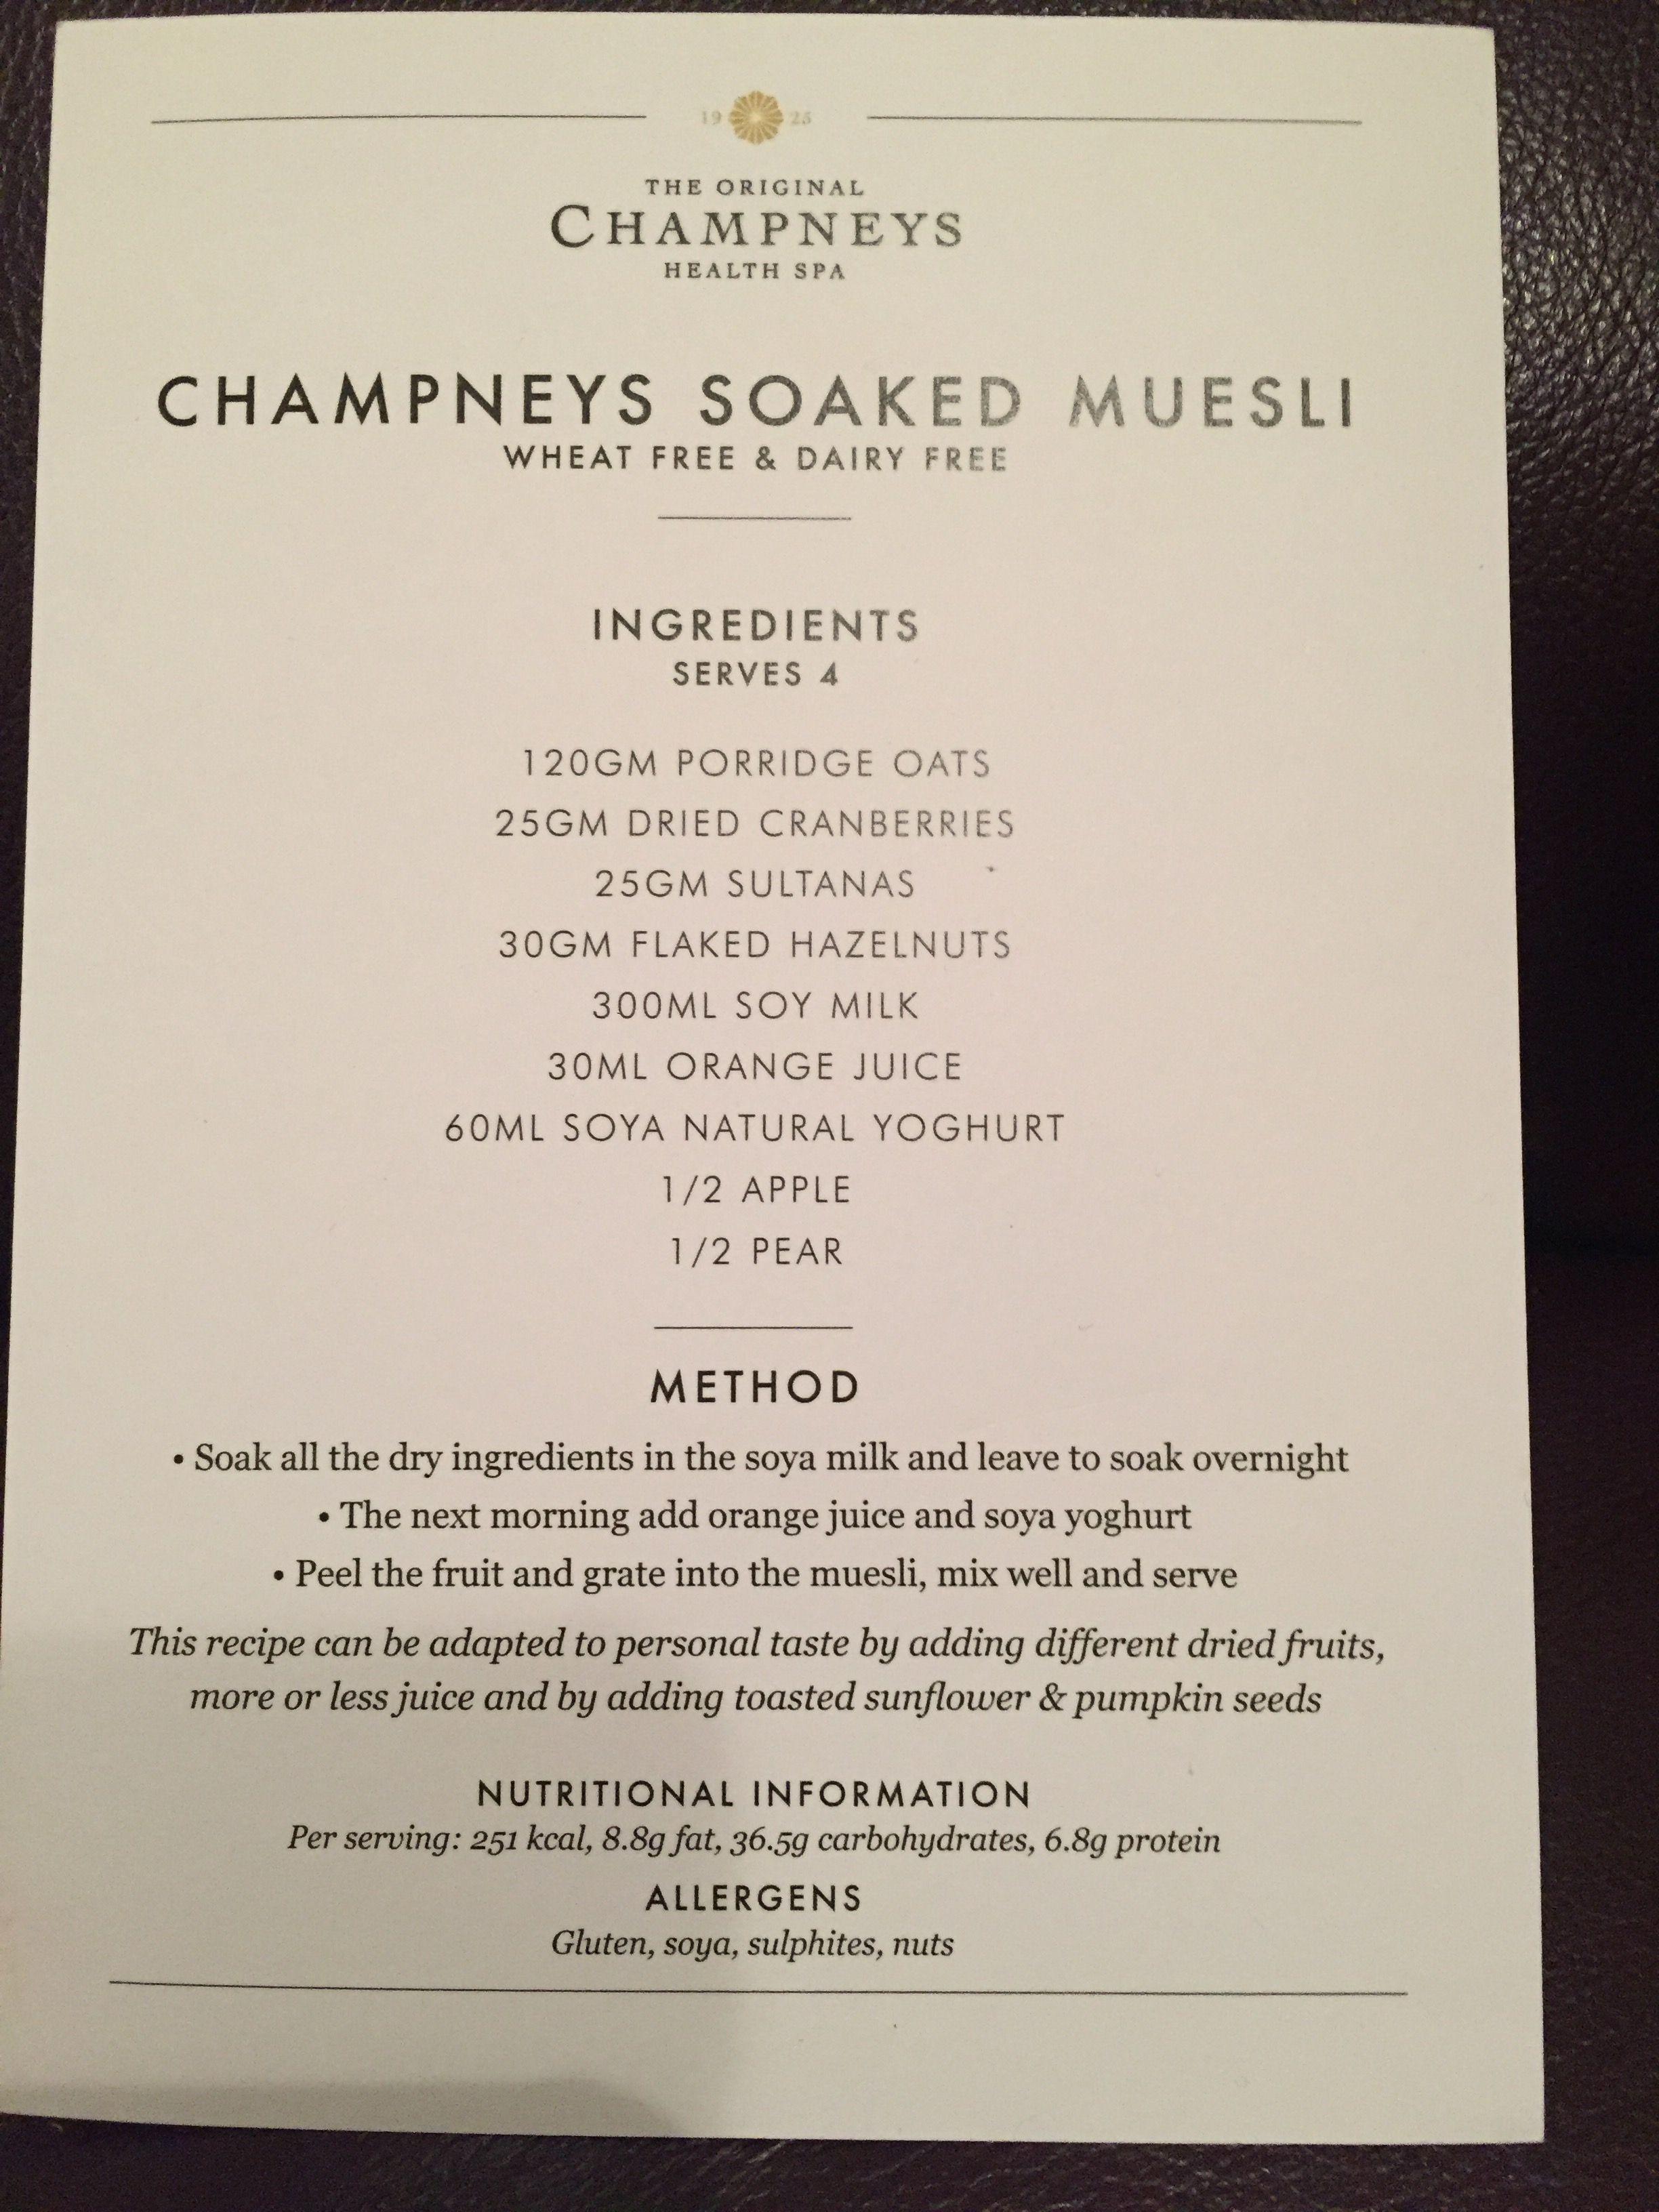 Champneys soaked muesli Muesli, Porridge oats, Dried